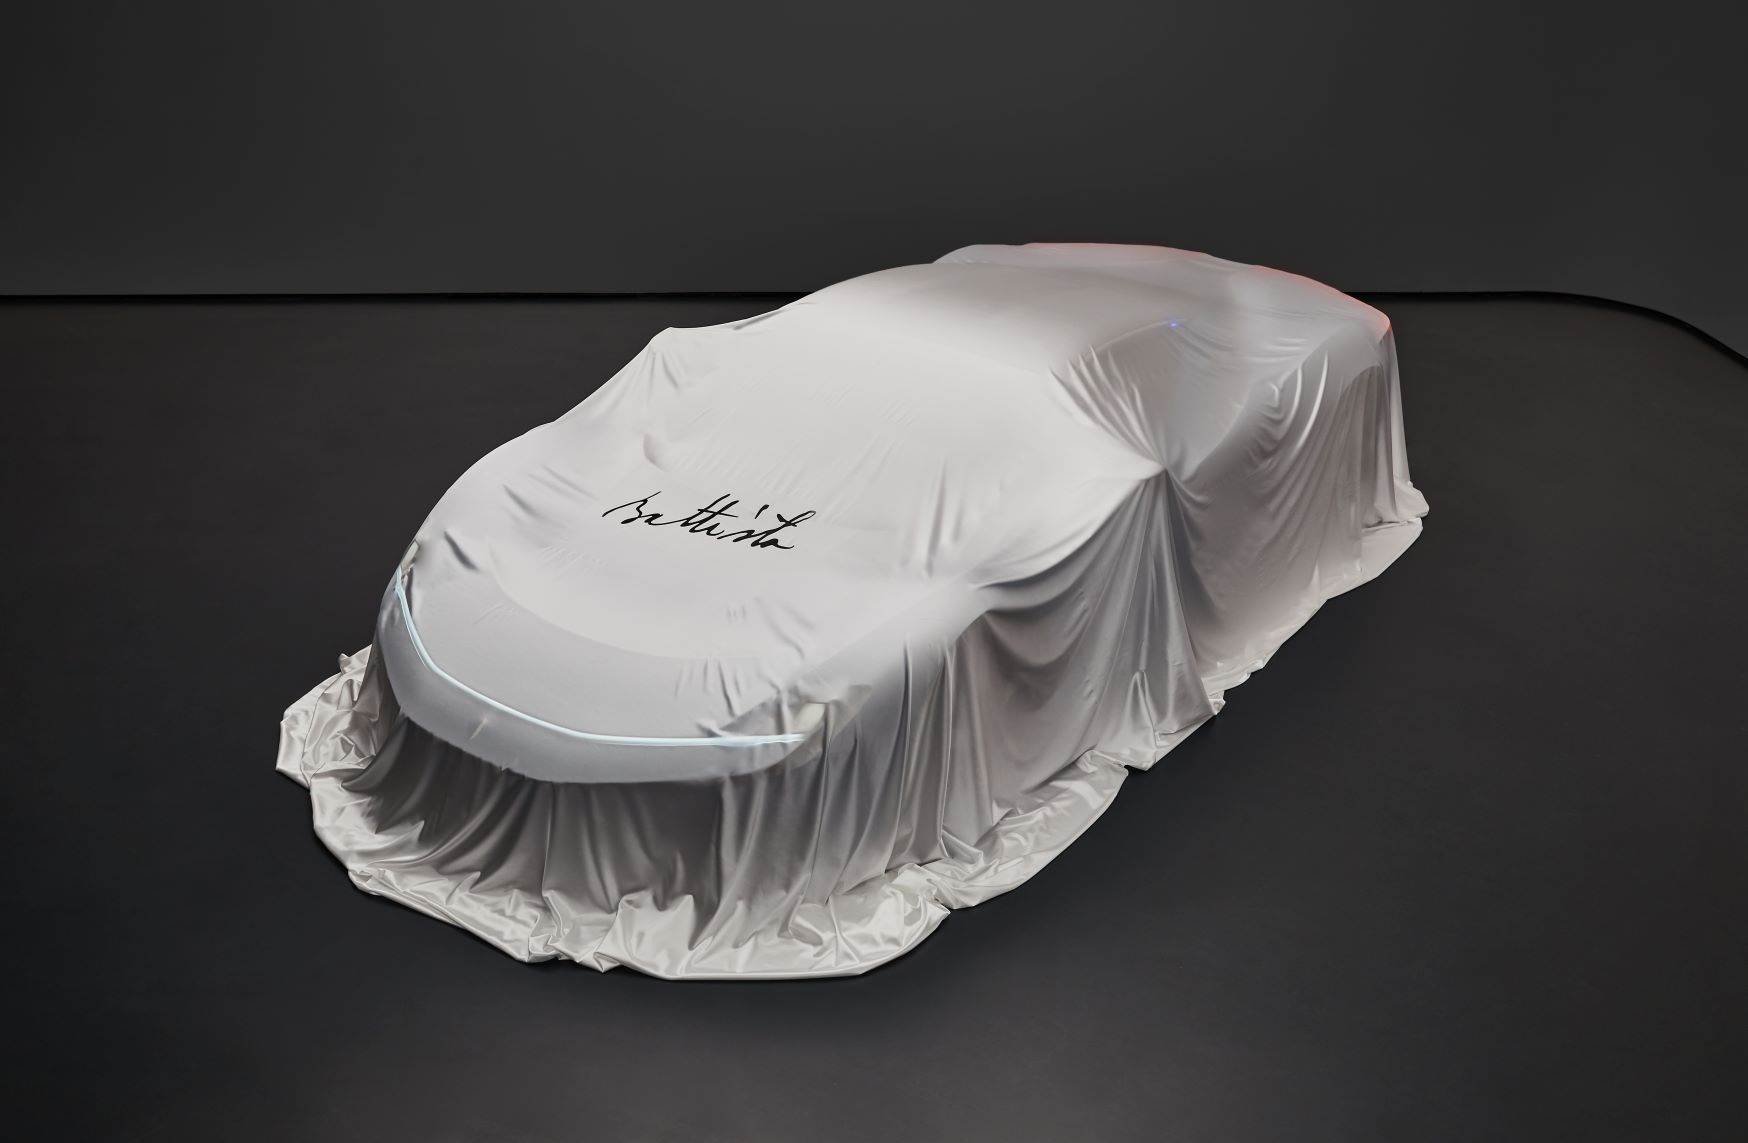 Automobili Pininfarnia's electric hypercar named Battista